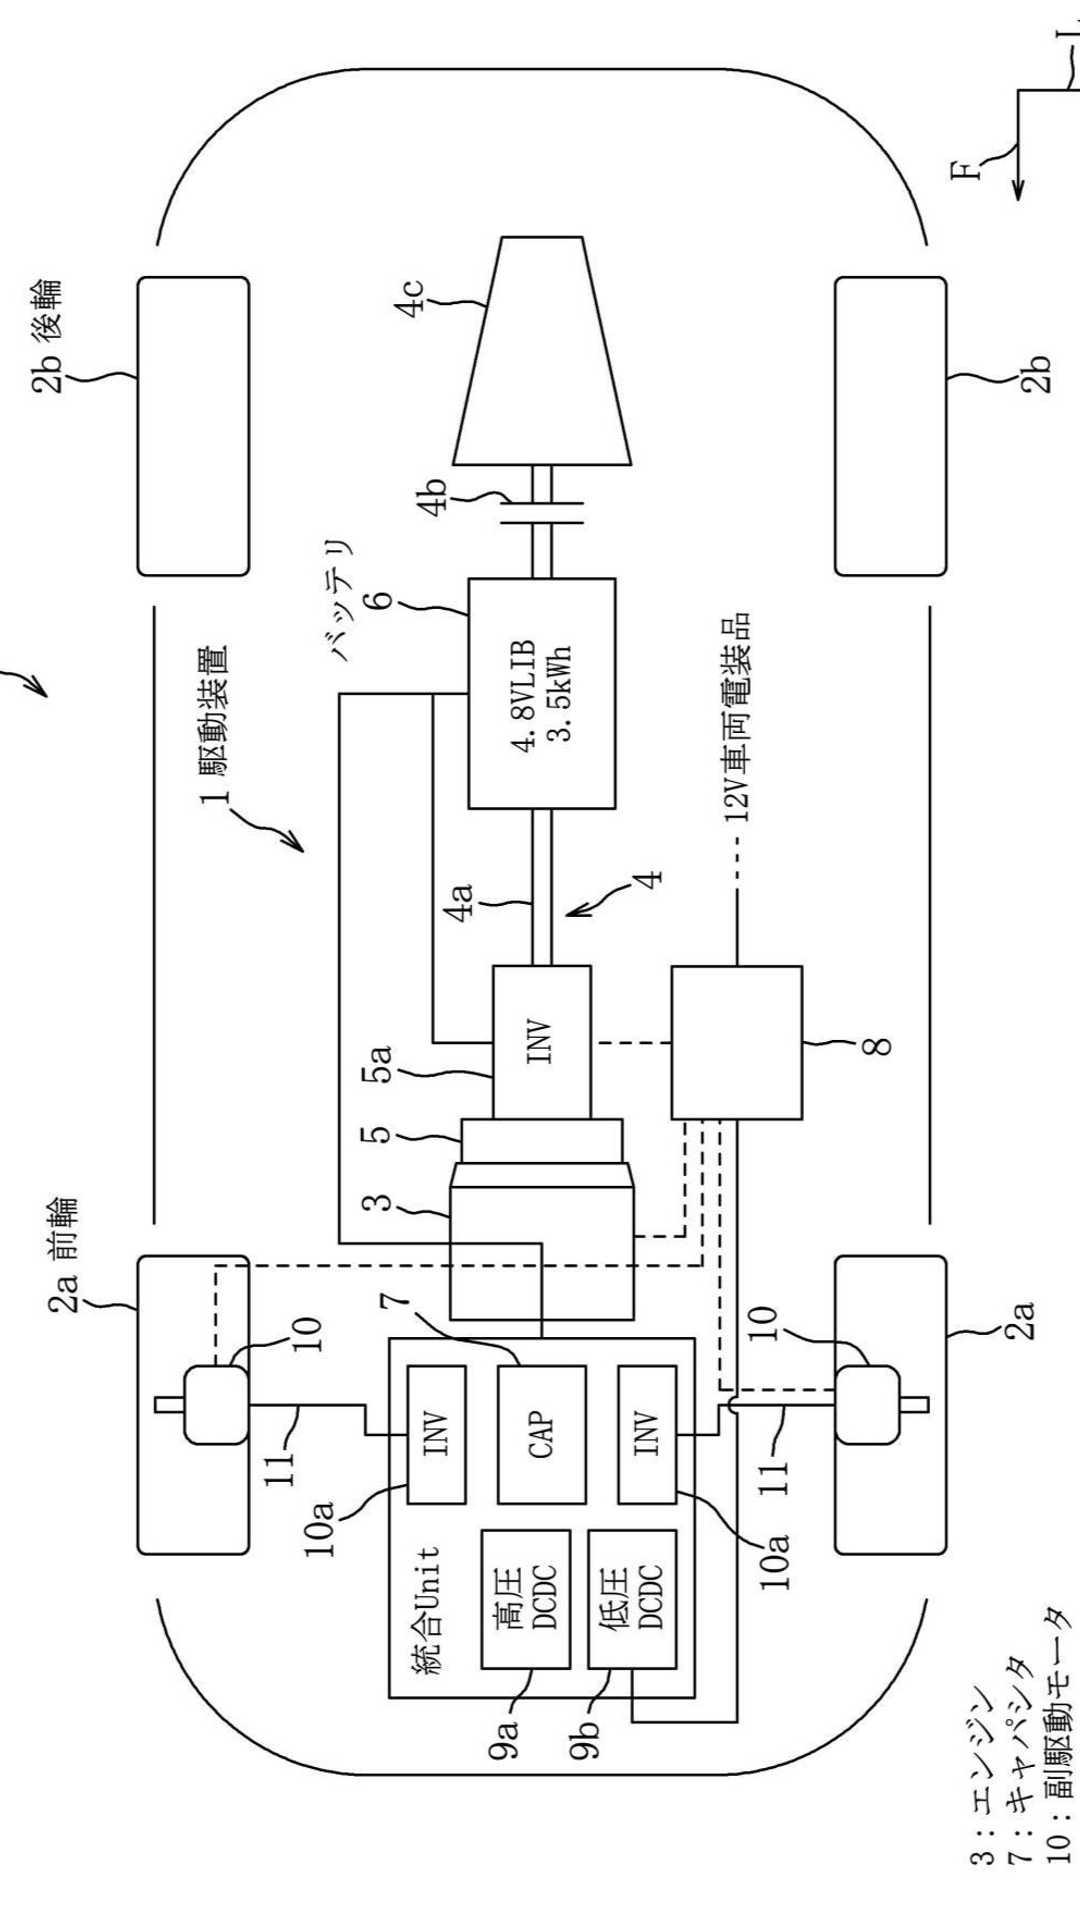 Mazda-Rotary-Engine-Hybrid-Patent-2